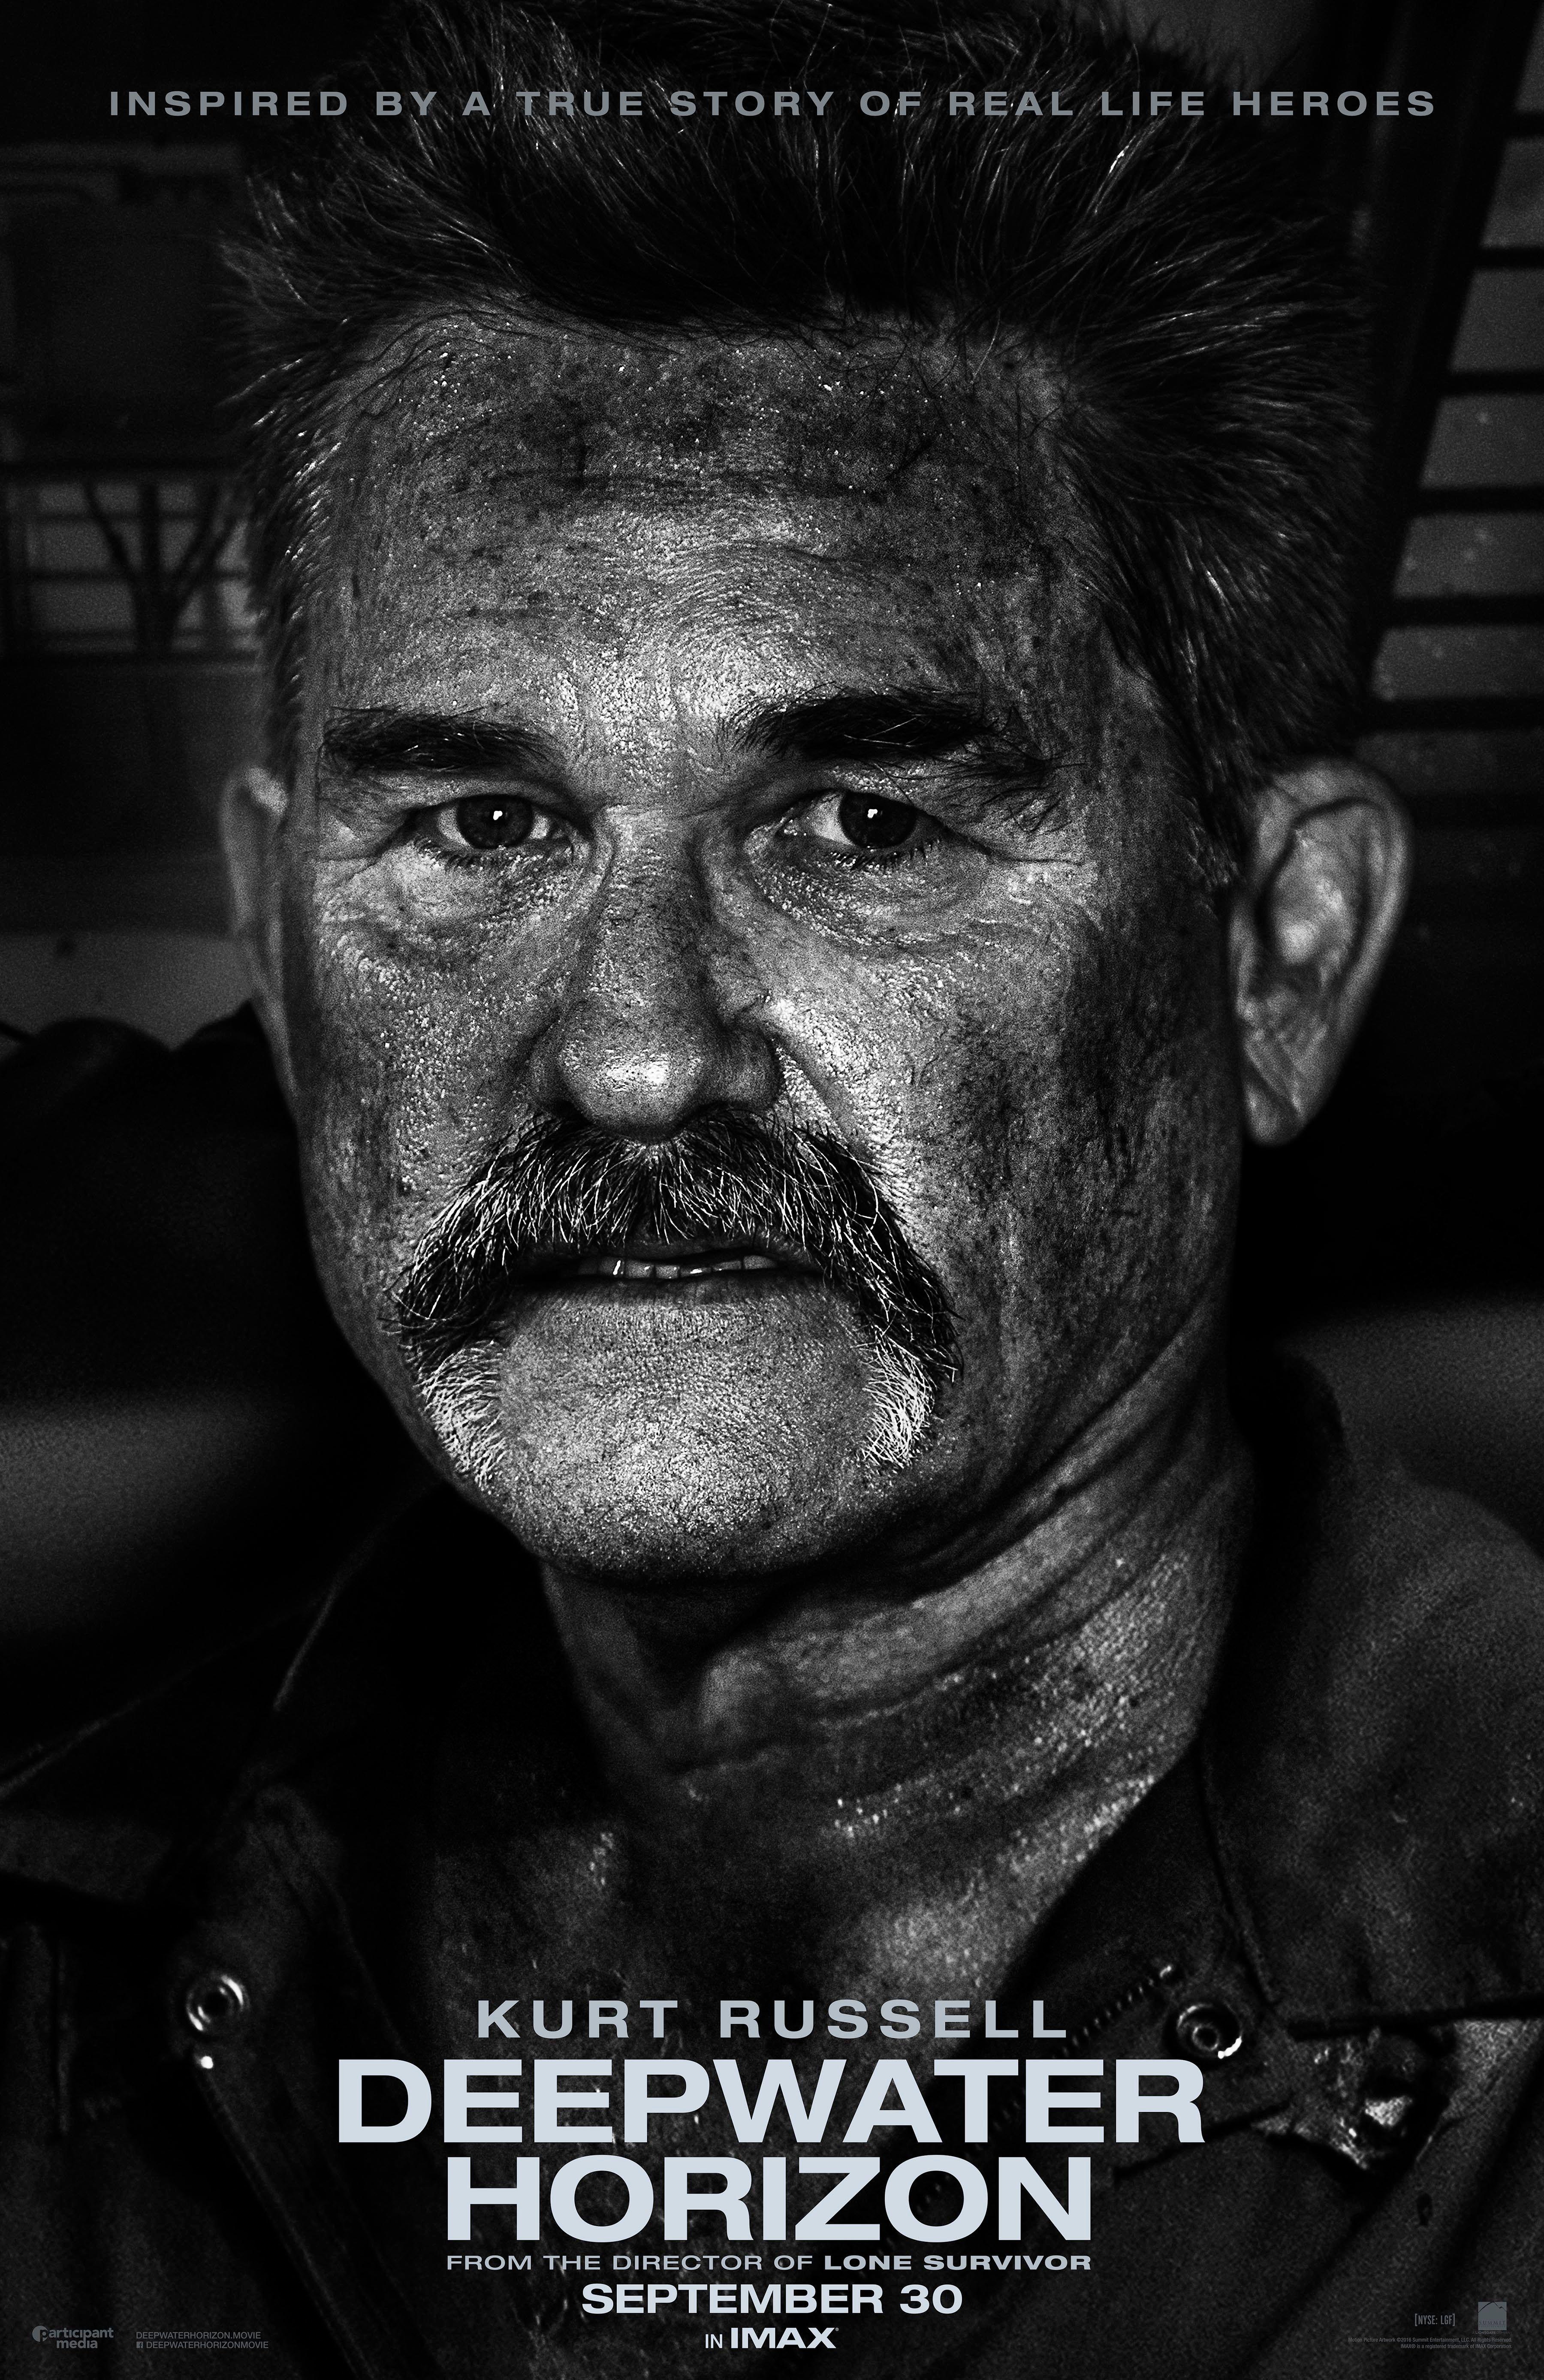 dylan o'brien – joel watches movies |Deepwater Horizon Movie Poster